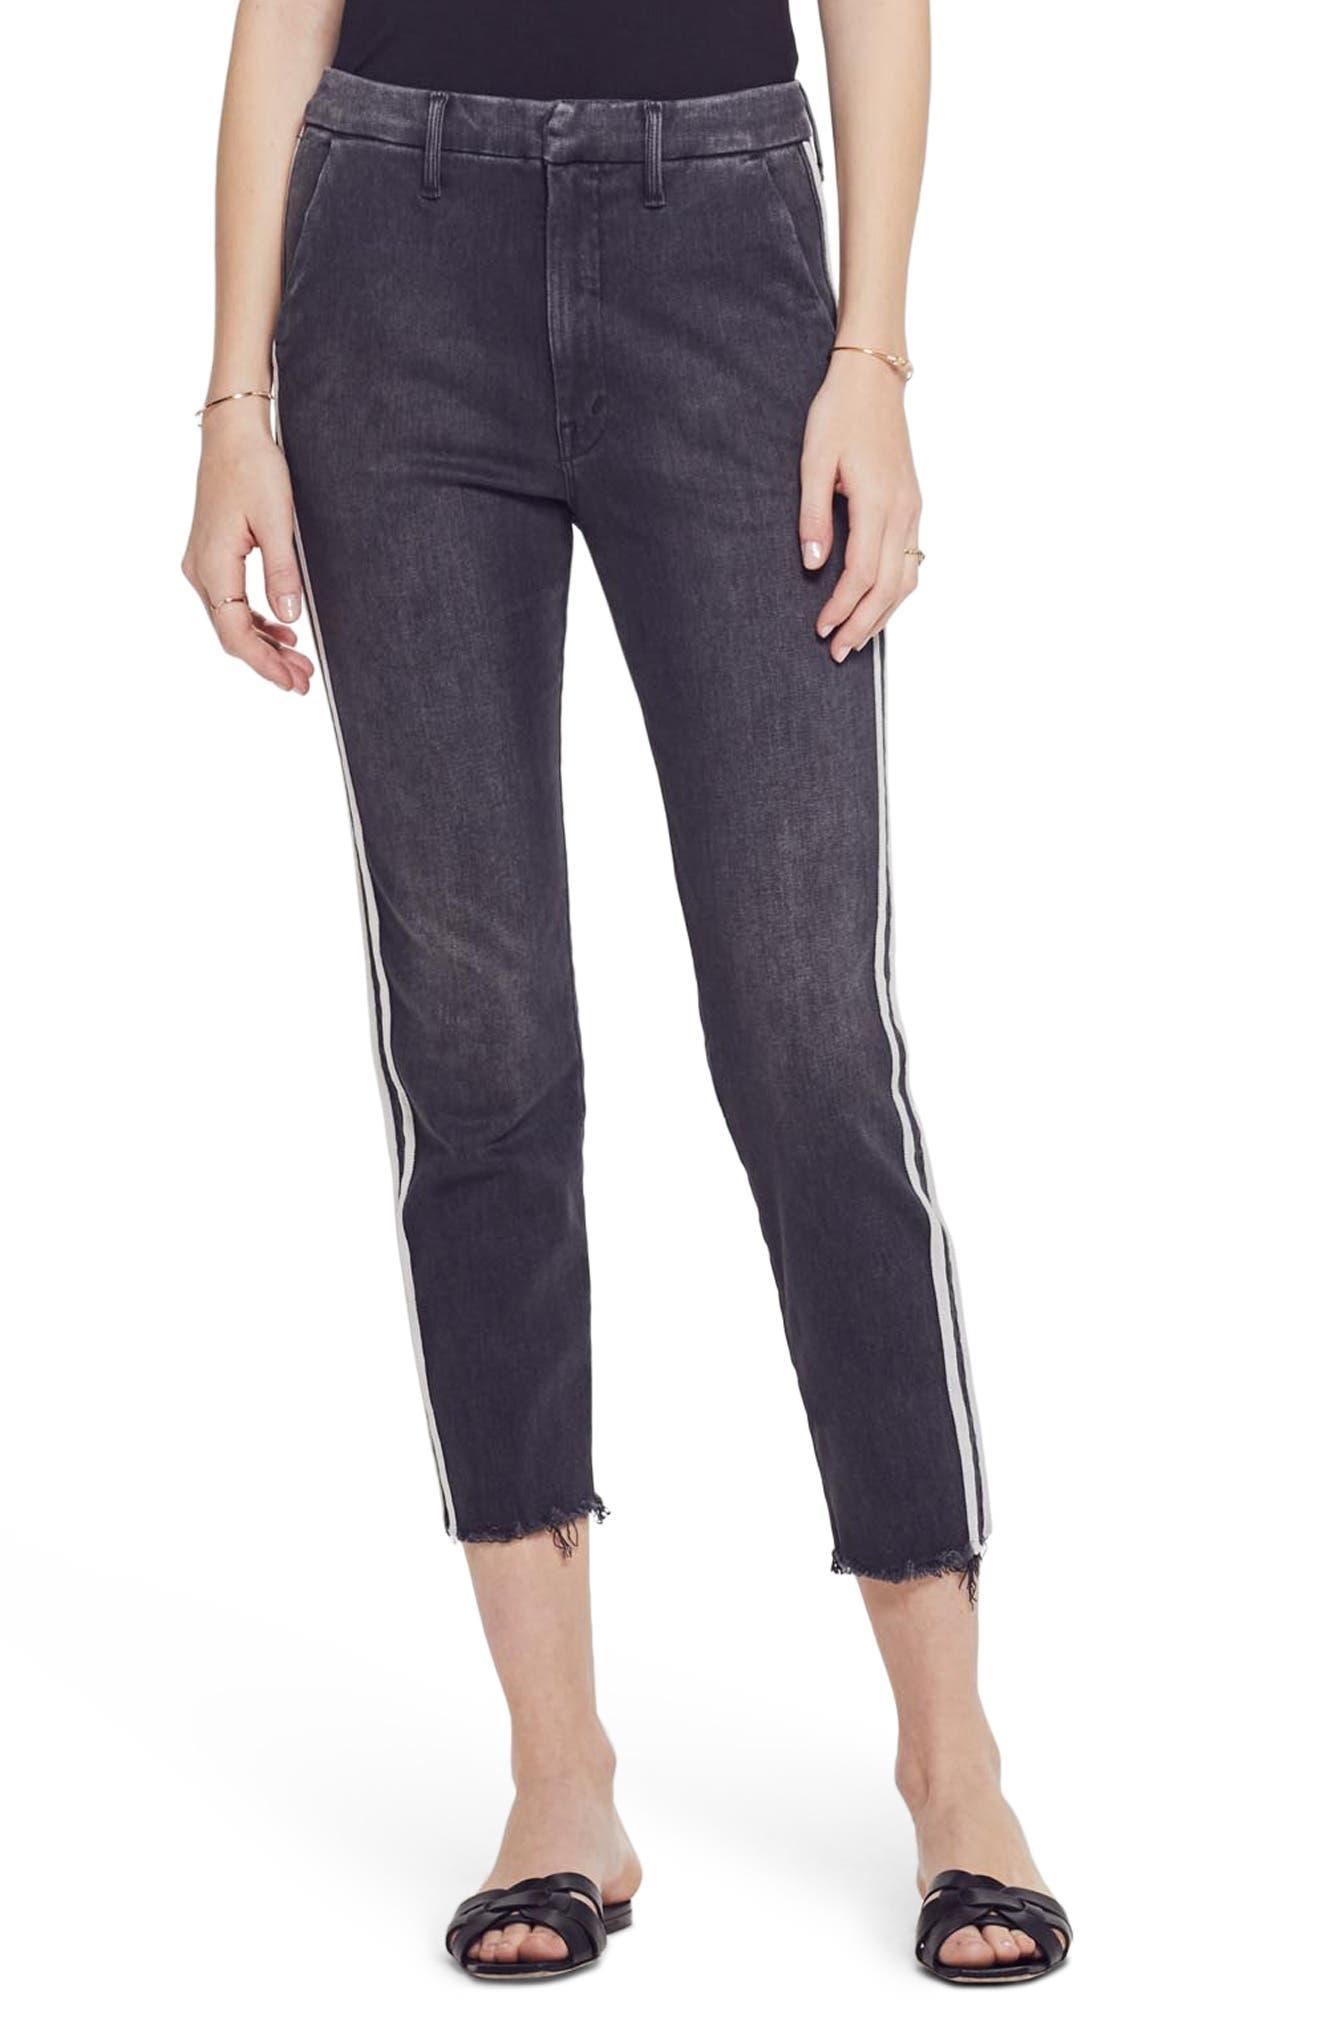 MOTHER, The Shaker Prep High Waist Crop Slim Jeans, Main thumbnail 1, color, DEAR MR. BLACK RACER